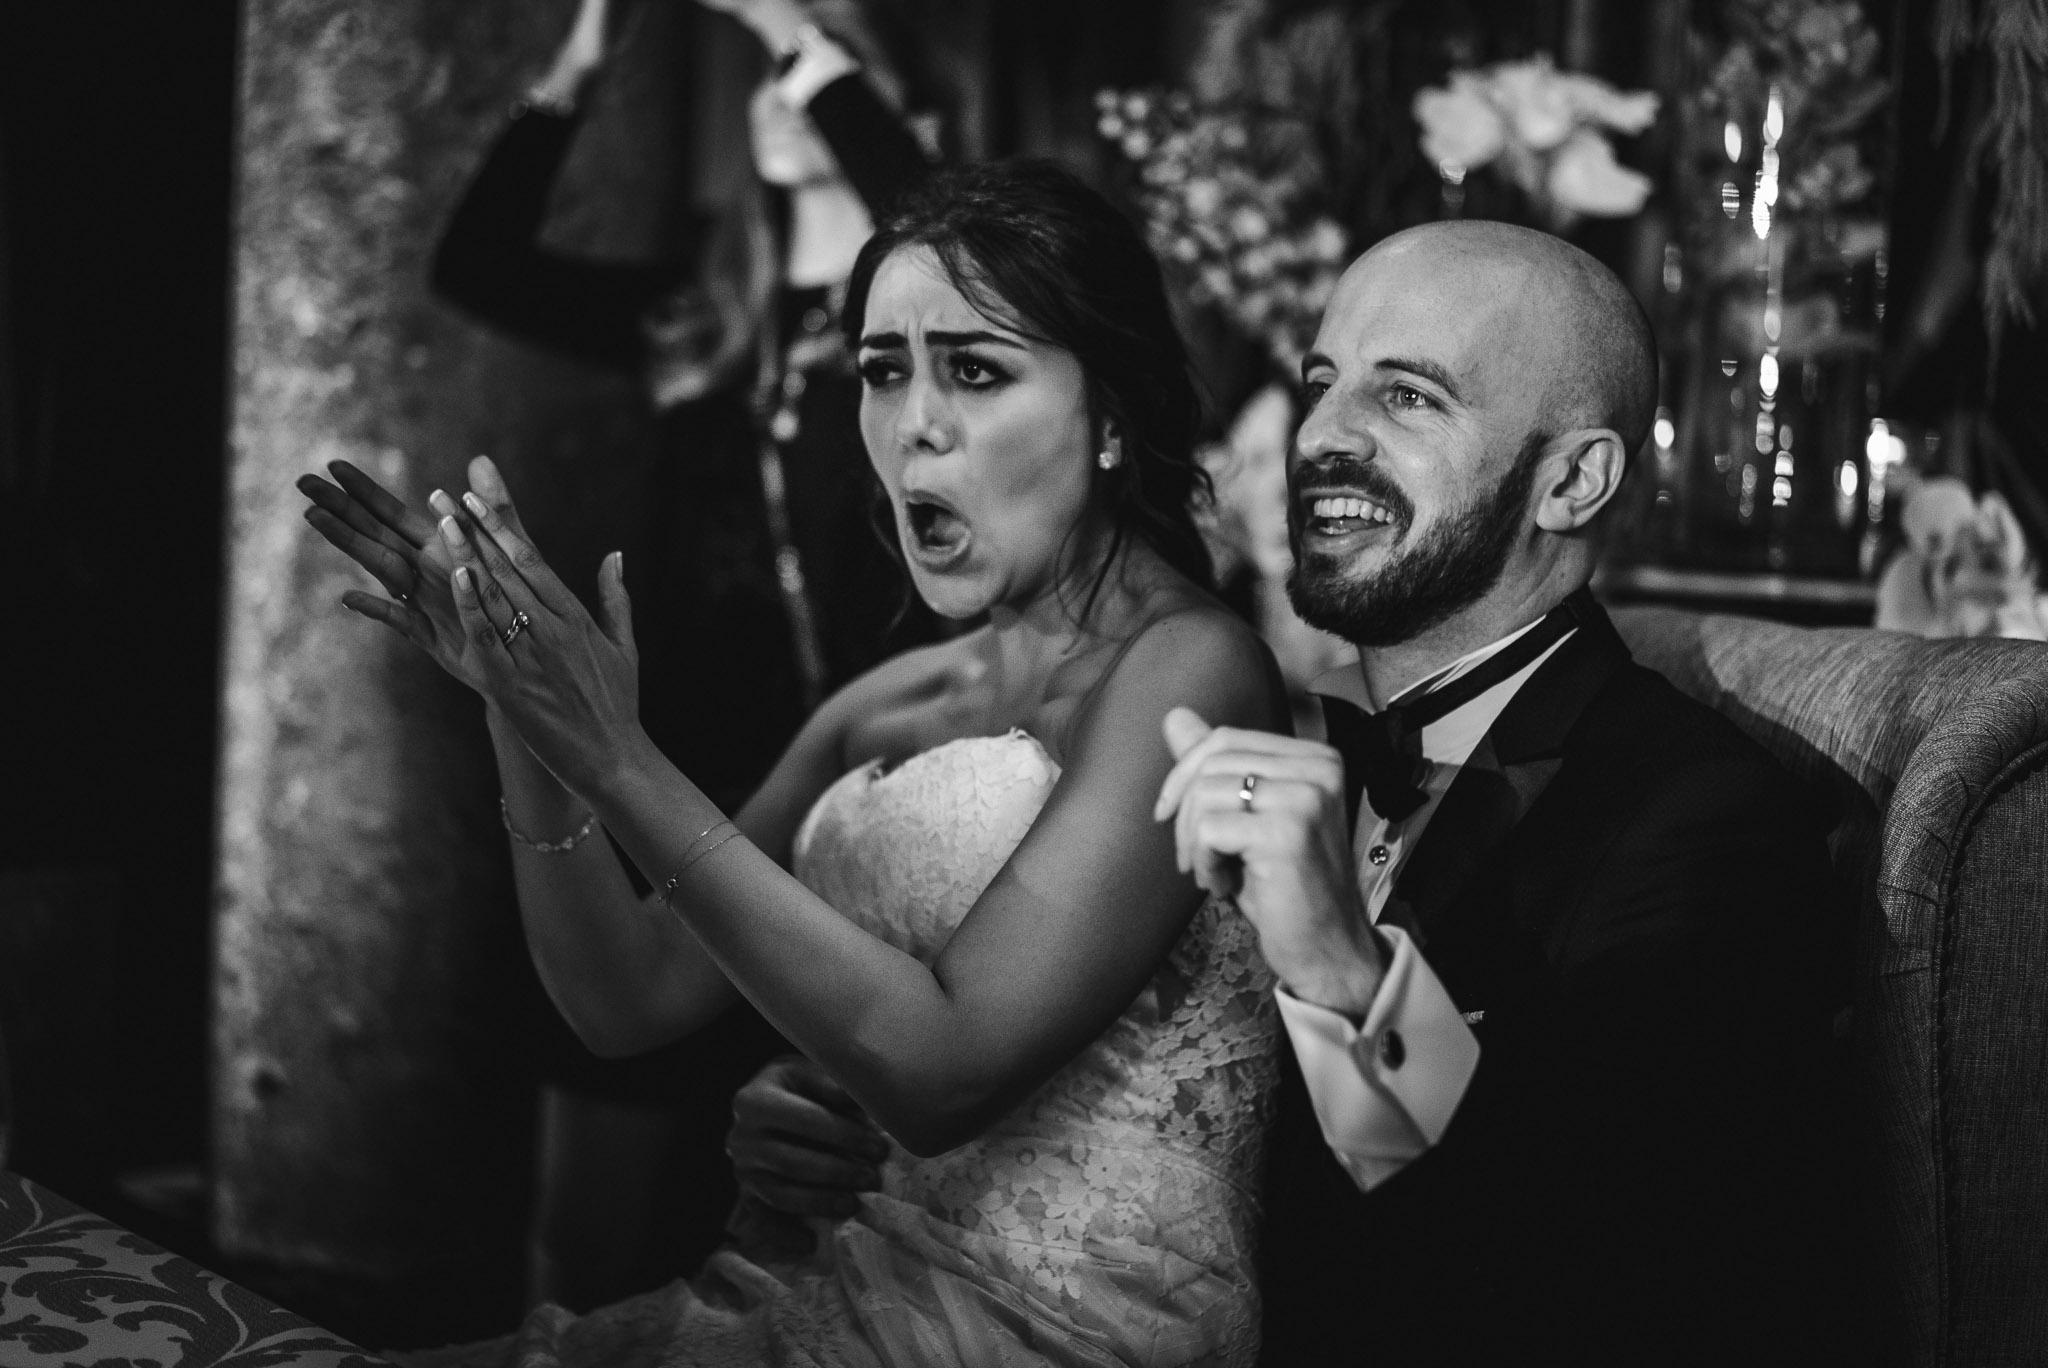 ©www.mauriziosolisbroca.com-20161002maurizio-solis-broca-mexico-canada-wedding-photographer20161002DSC08457-Edit.jpg